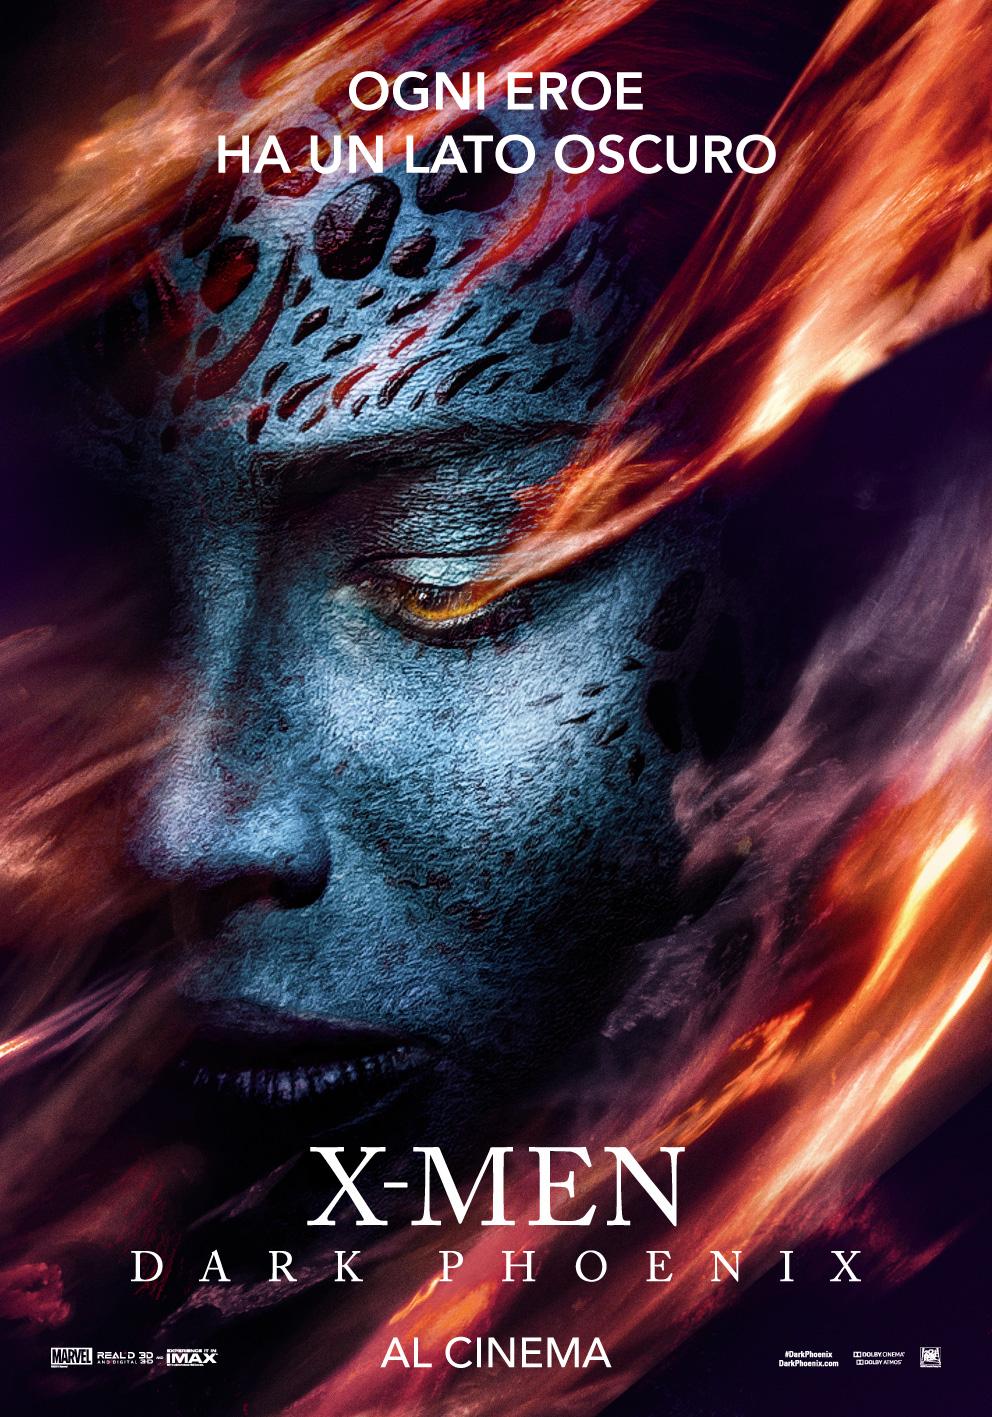 X-Men: Dark Phoenix, il character poster per Mistica